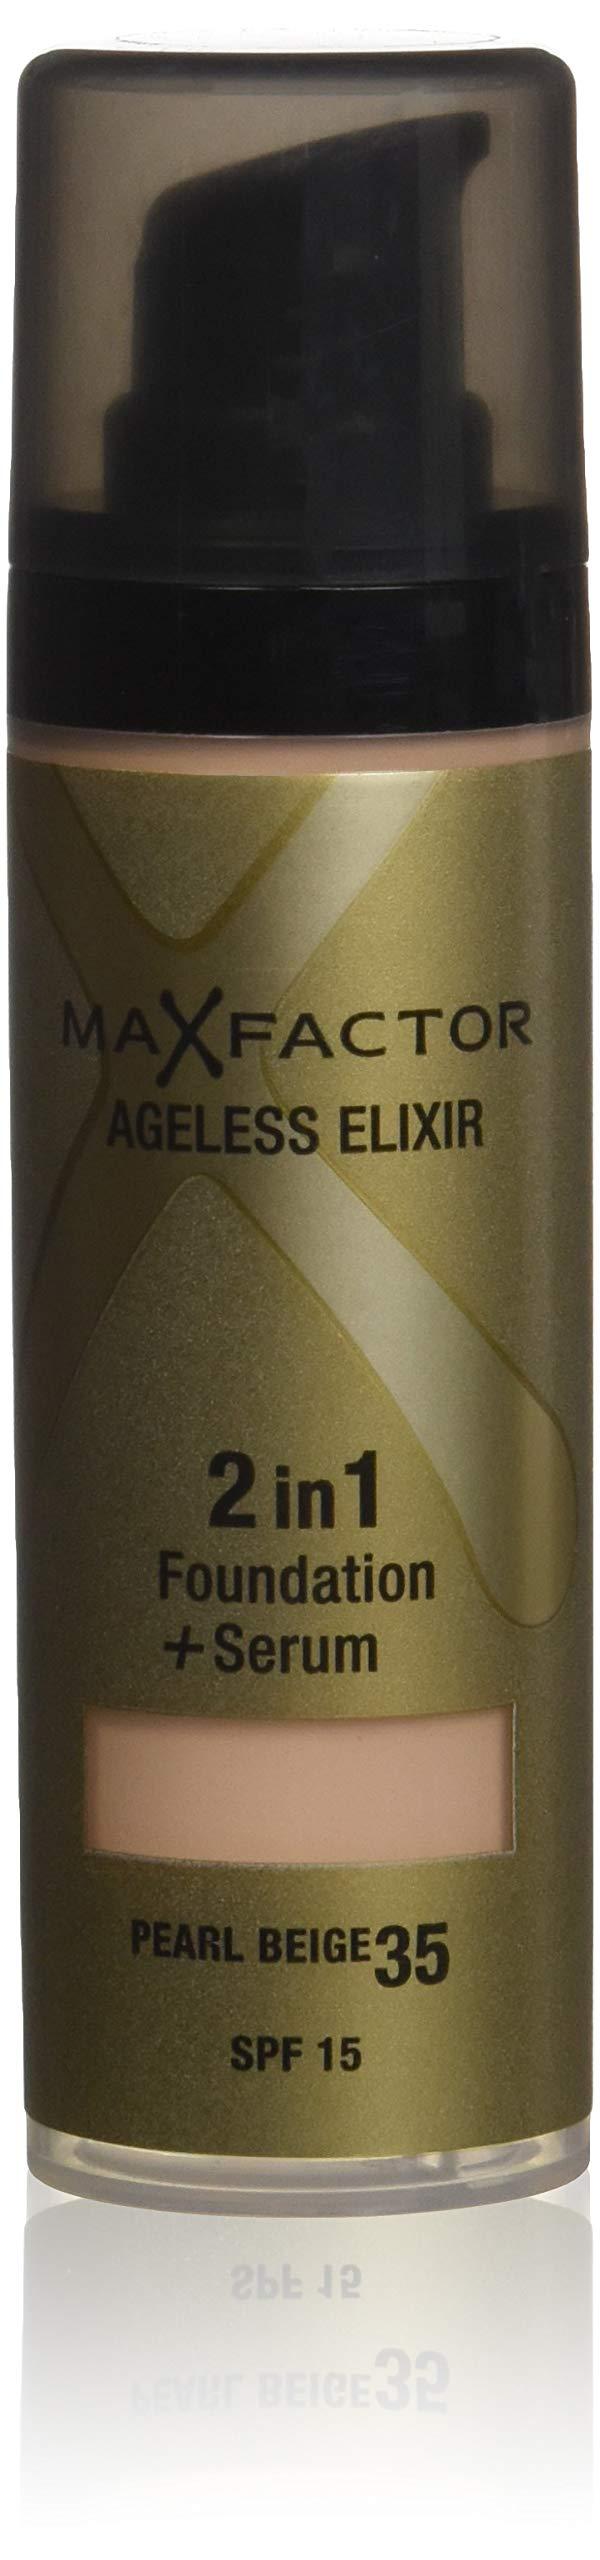 max factor ageless elixir 2 in 1 foundation beige